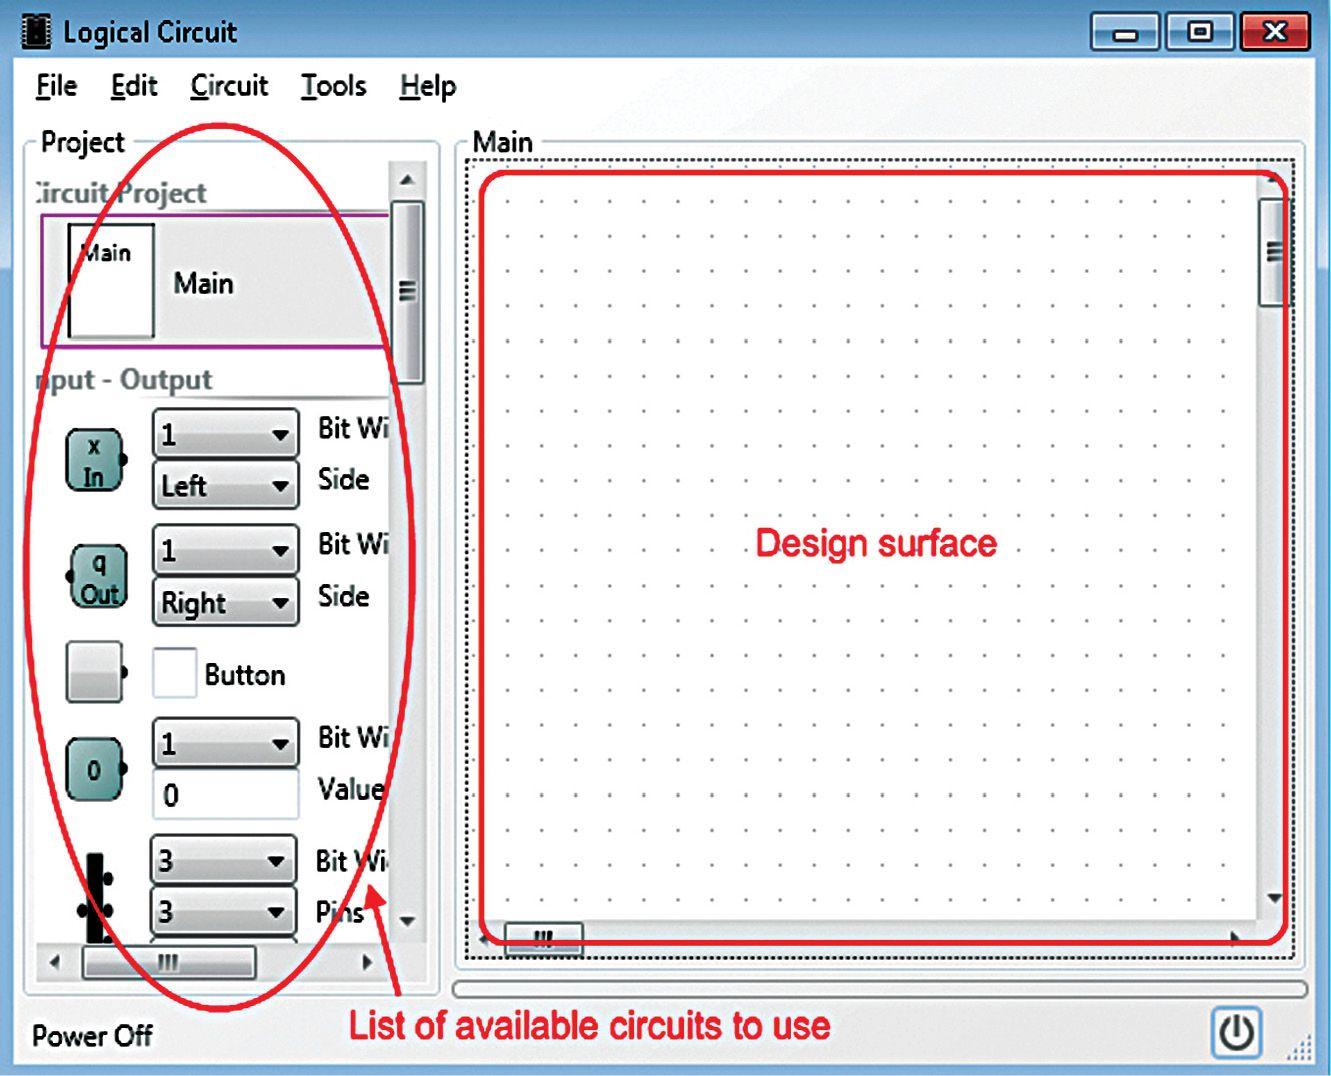 Logiccircuit Building Digital Circuits Made Easy Software Review Digital Circuit Circuit Gate Design